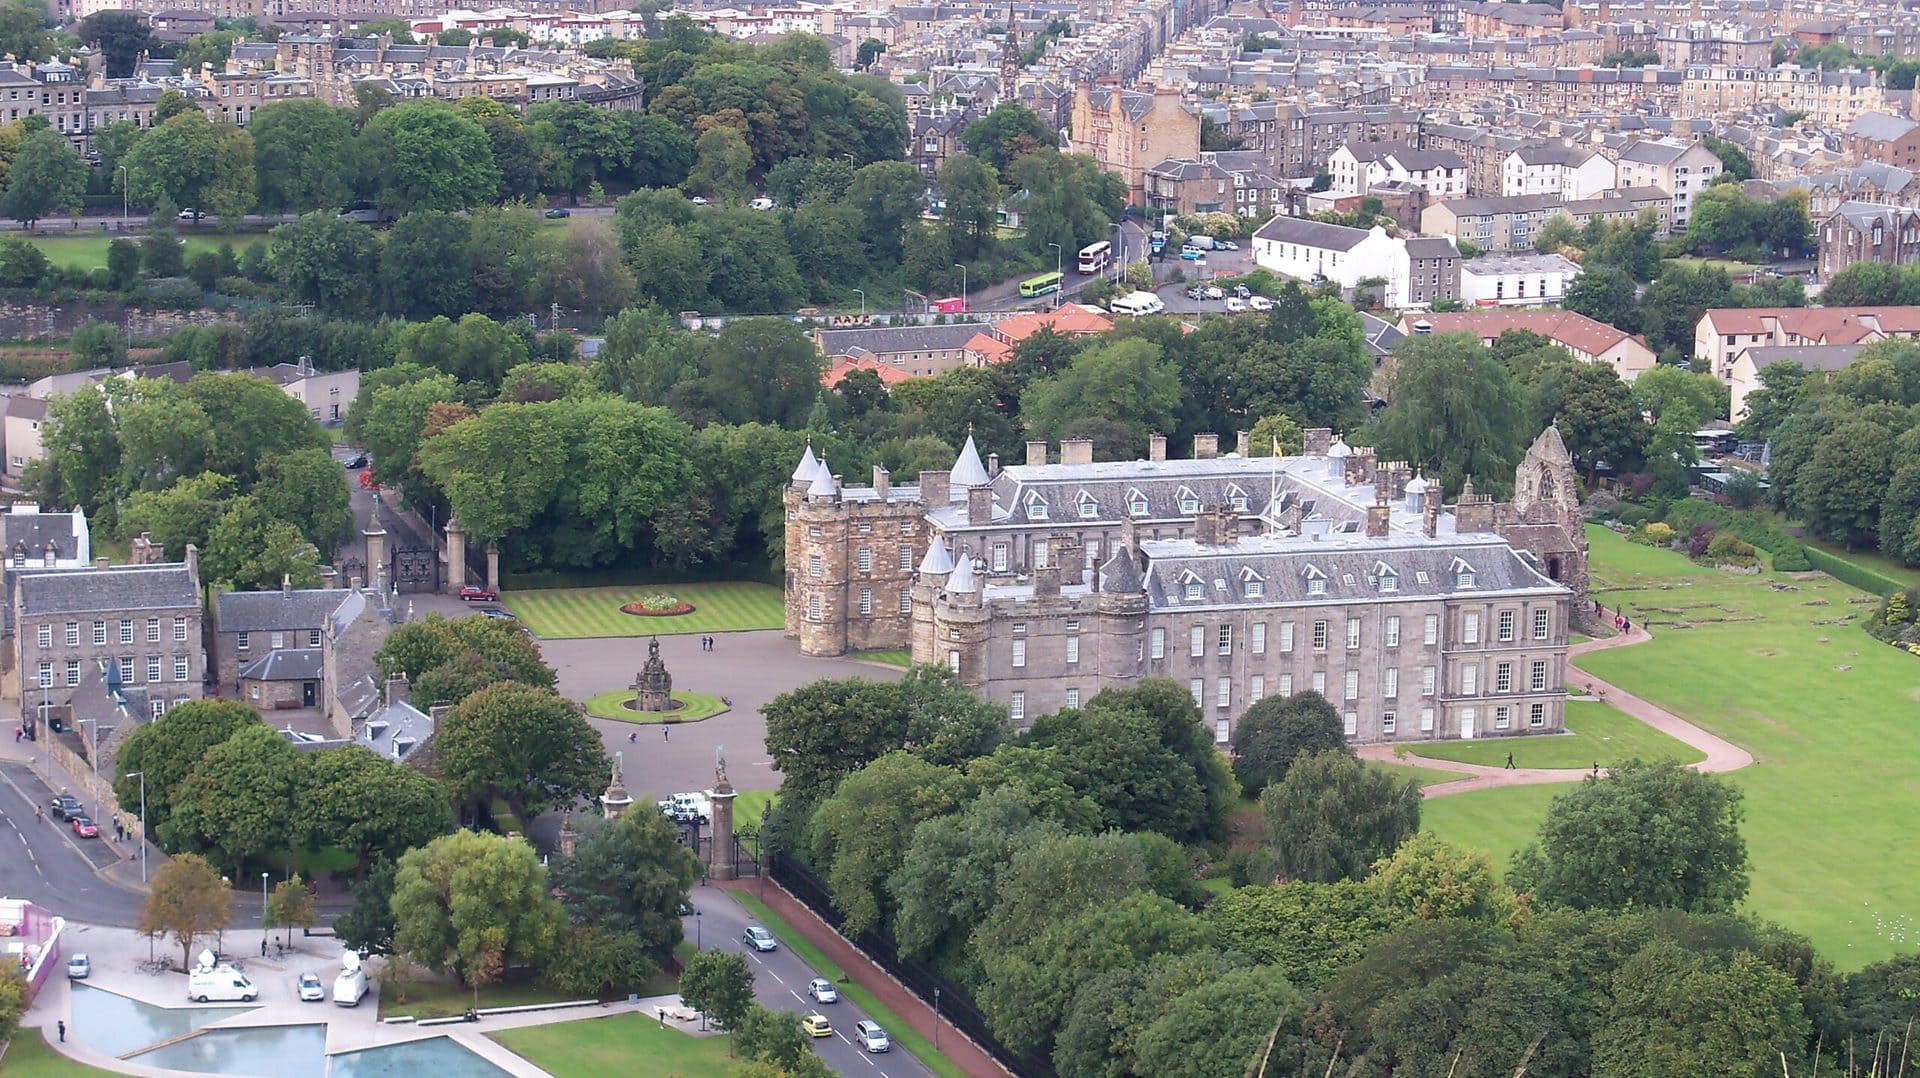 Studietur Edinburgh Palace of Holyroodhouse